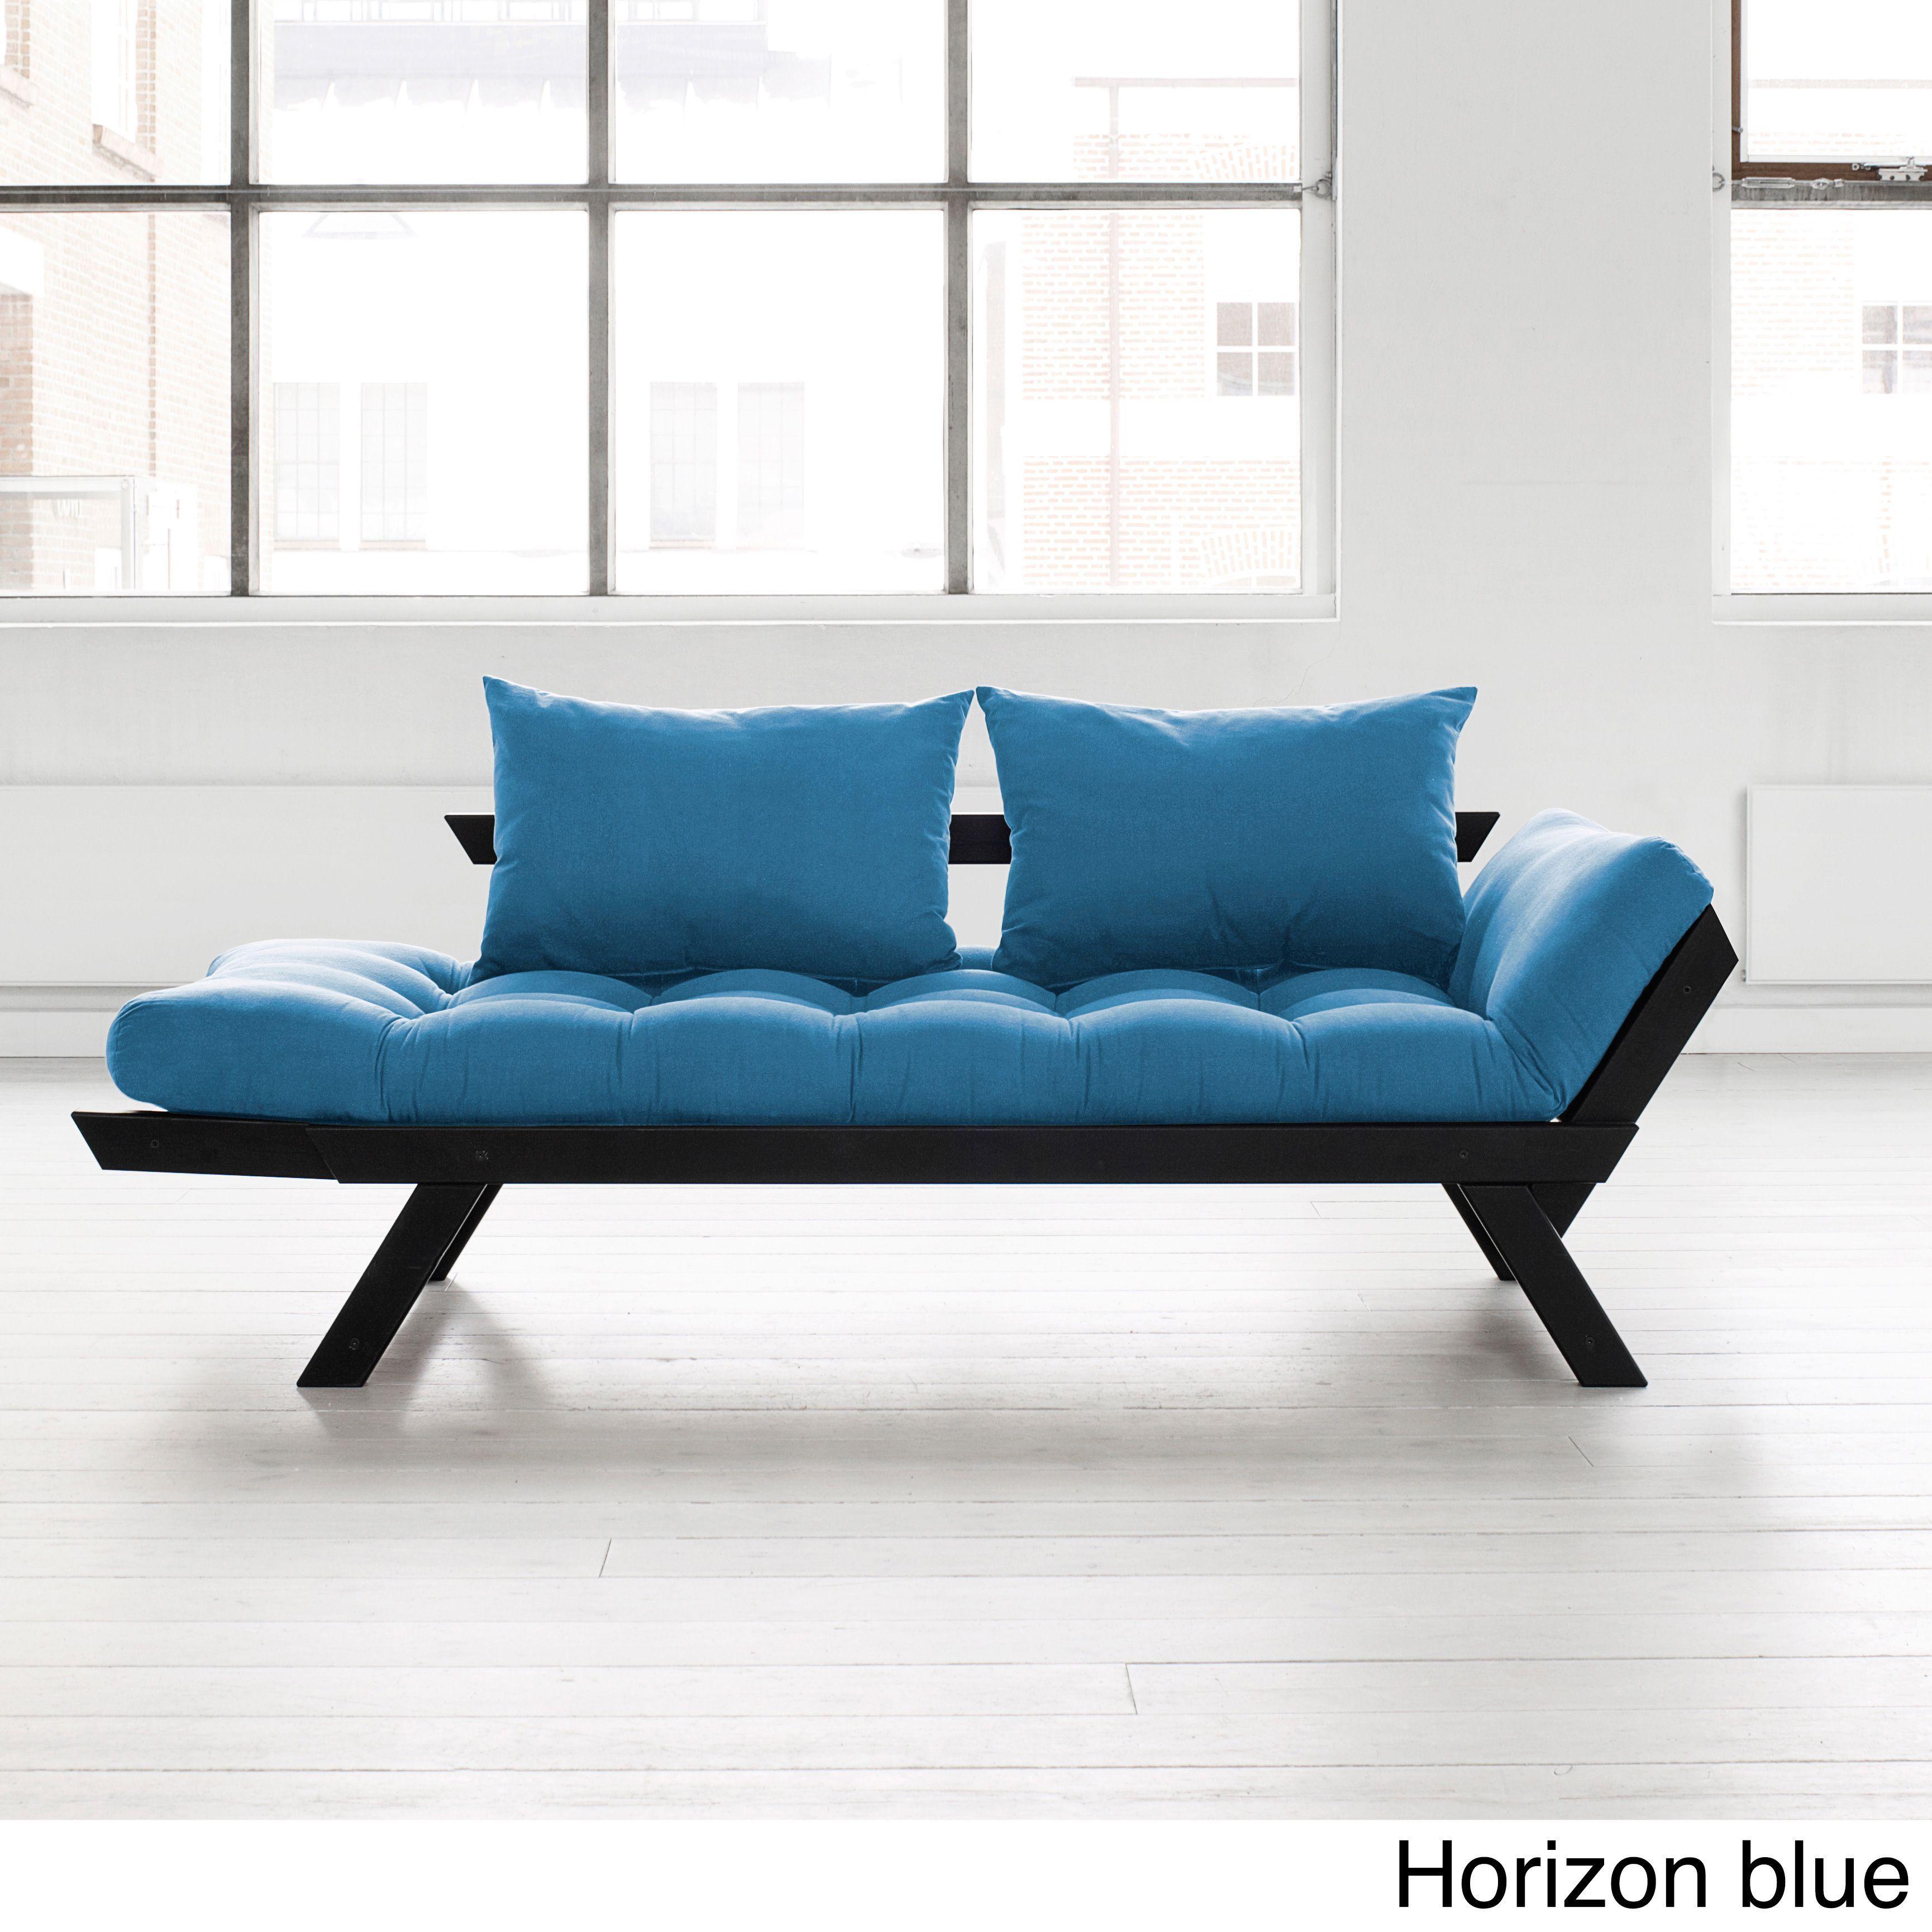 fresh futon bebop black frame with  mattress colors (lime  - fresh futon bebop black frame with  mattress colors (horizon bluemattress)